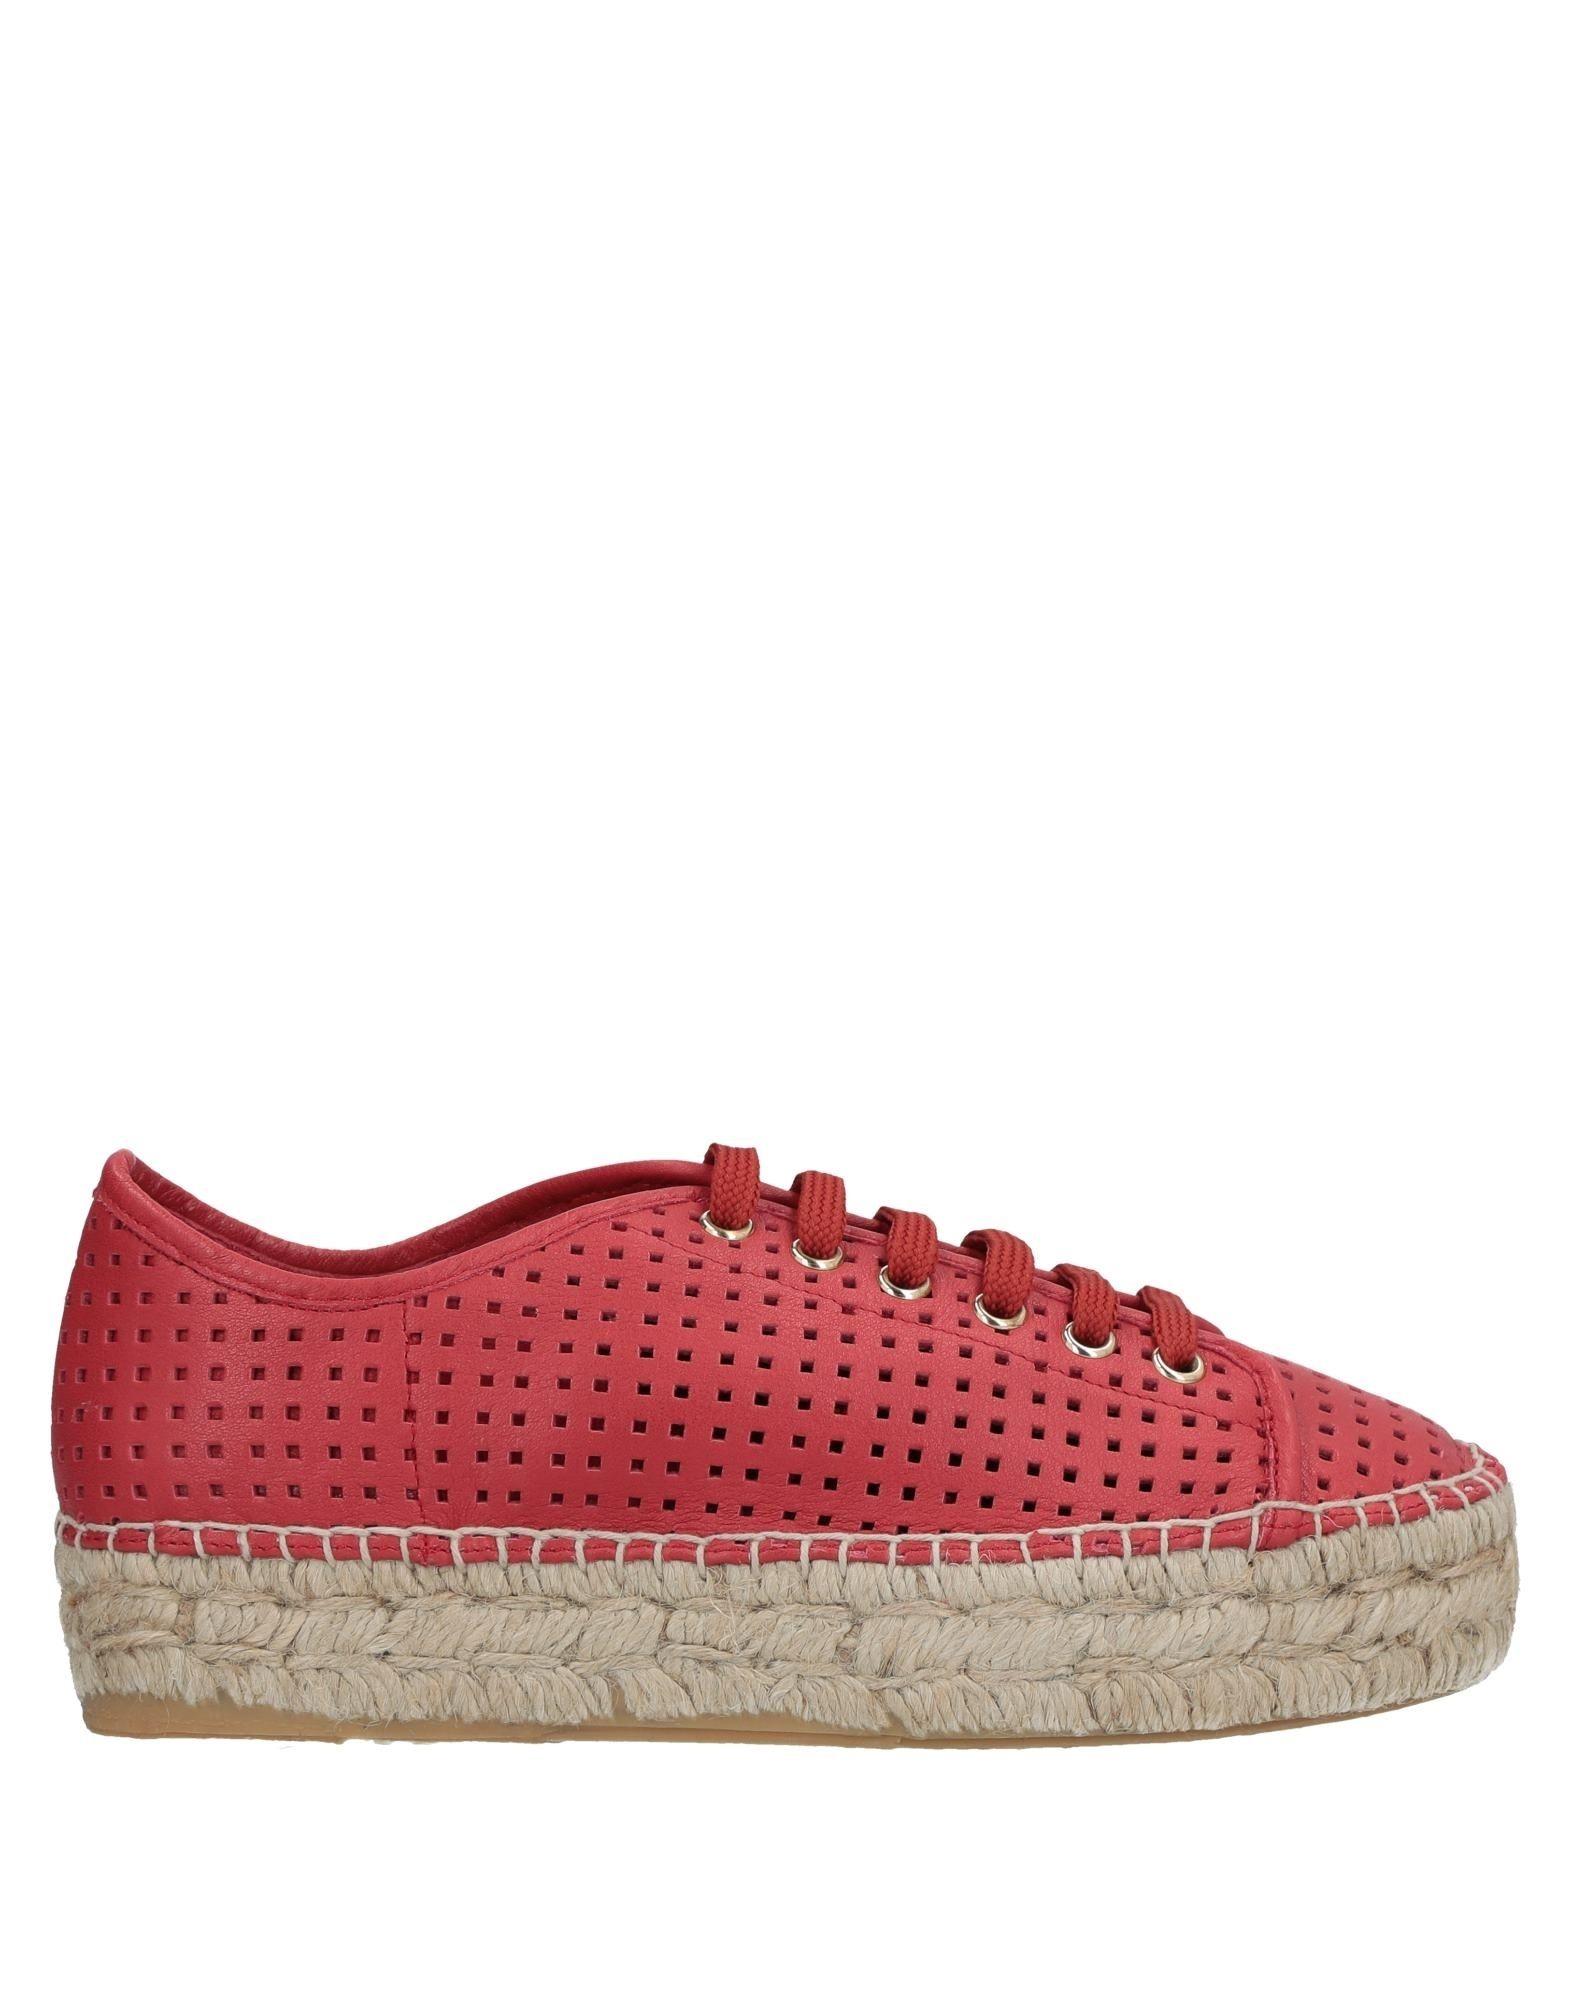 Palomitas By Paloma Barceló Sneakers Damen  11533386JF Gute Qualität beliebte Schuhe